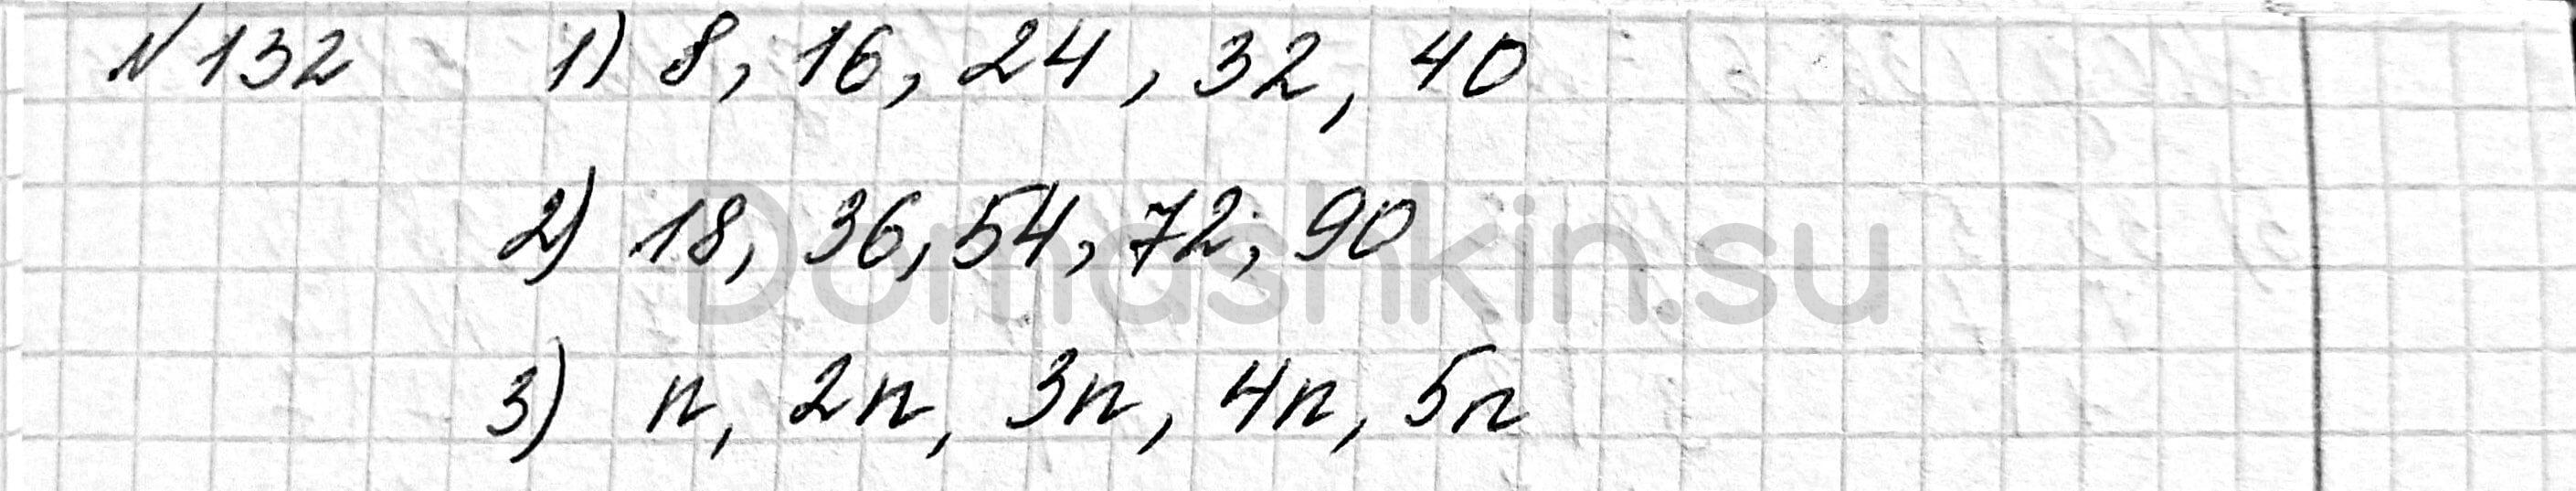 Математика 6 класс учебник Мерзляк номер 132 решение